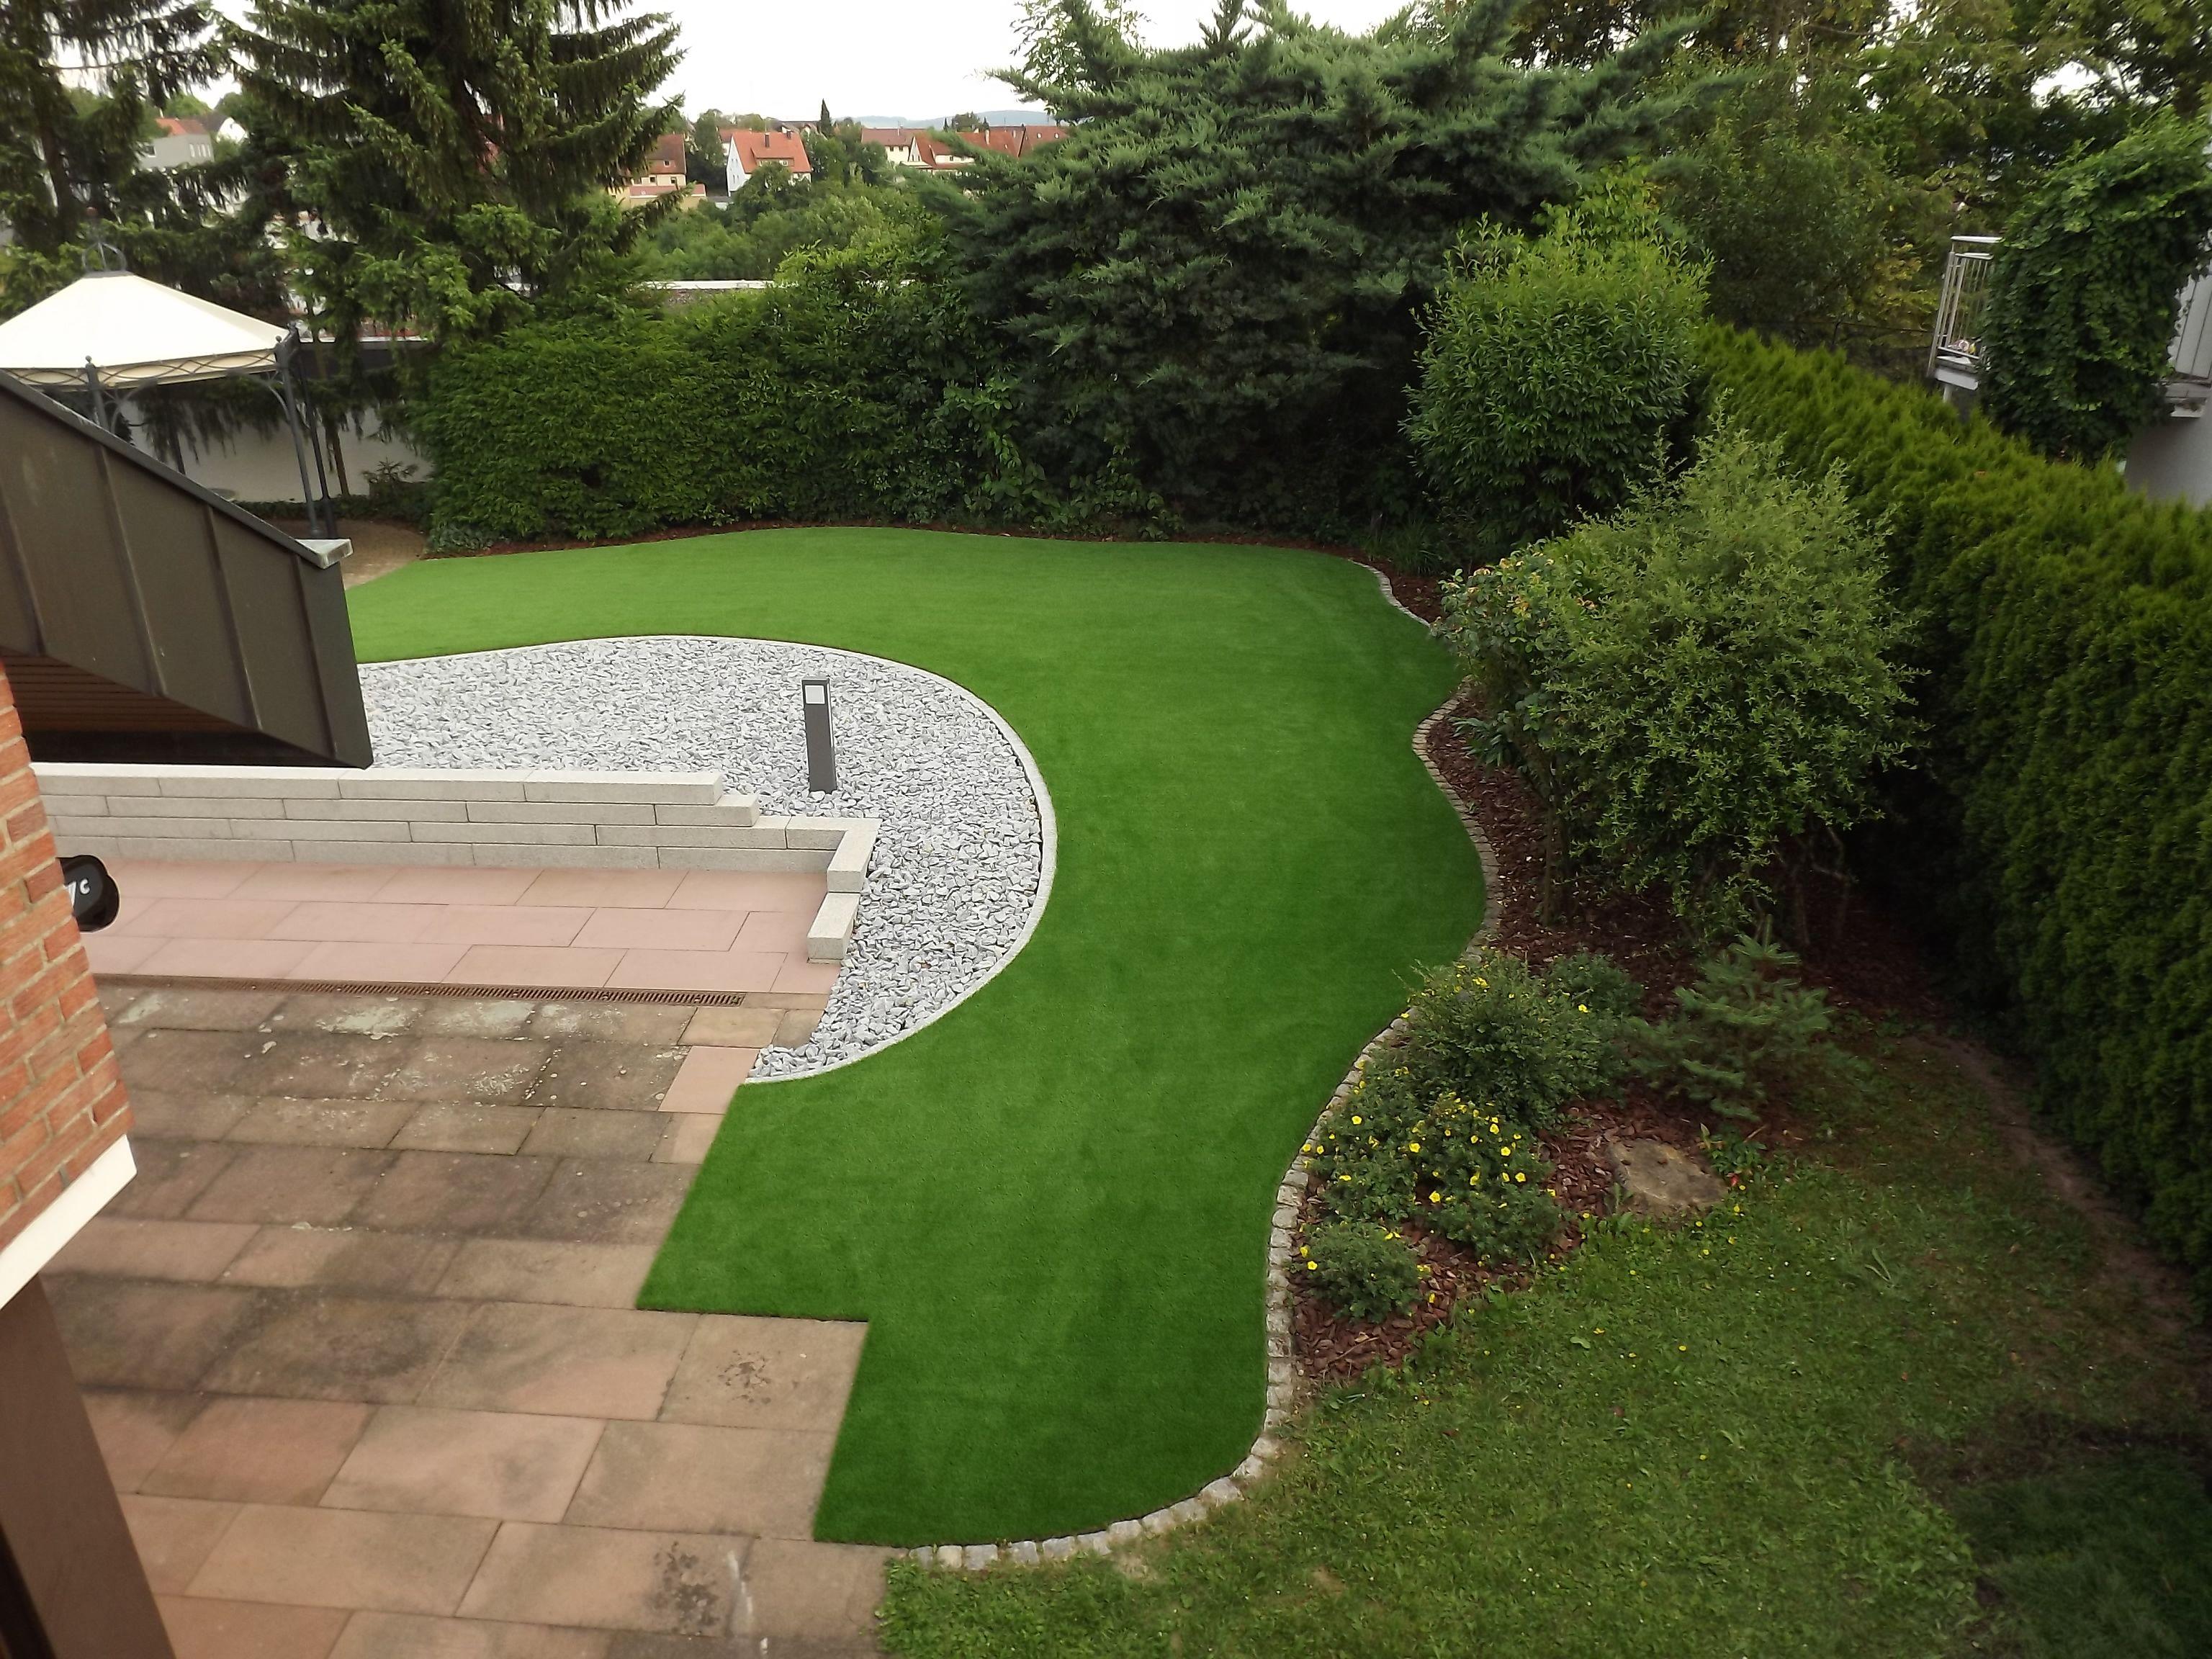 Der Perfekte Rasen Rasen Garten Gartenarbeit